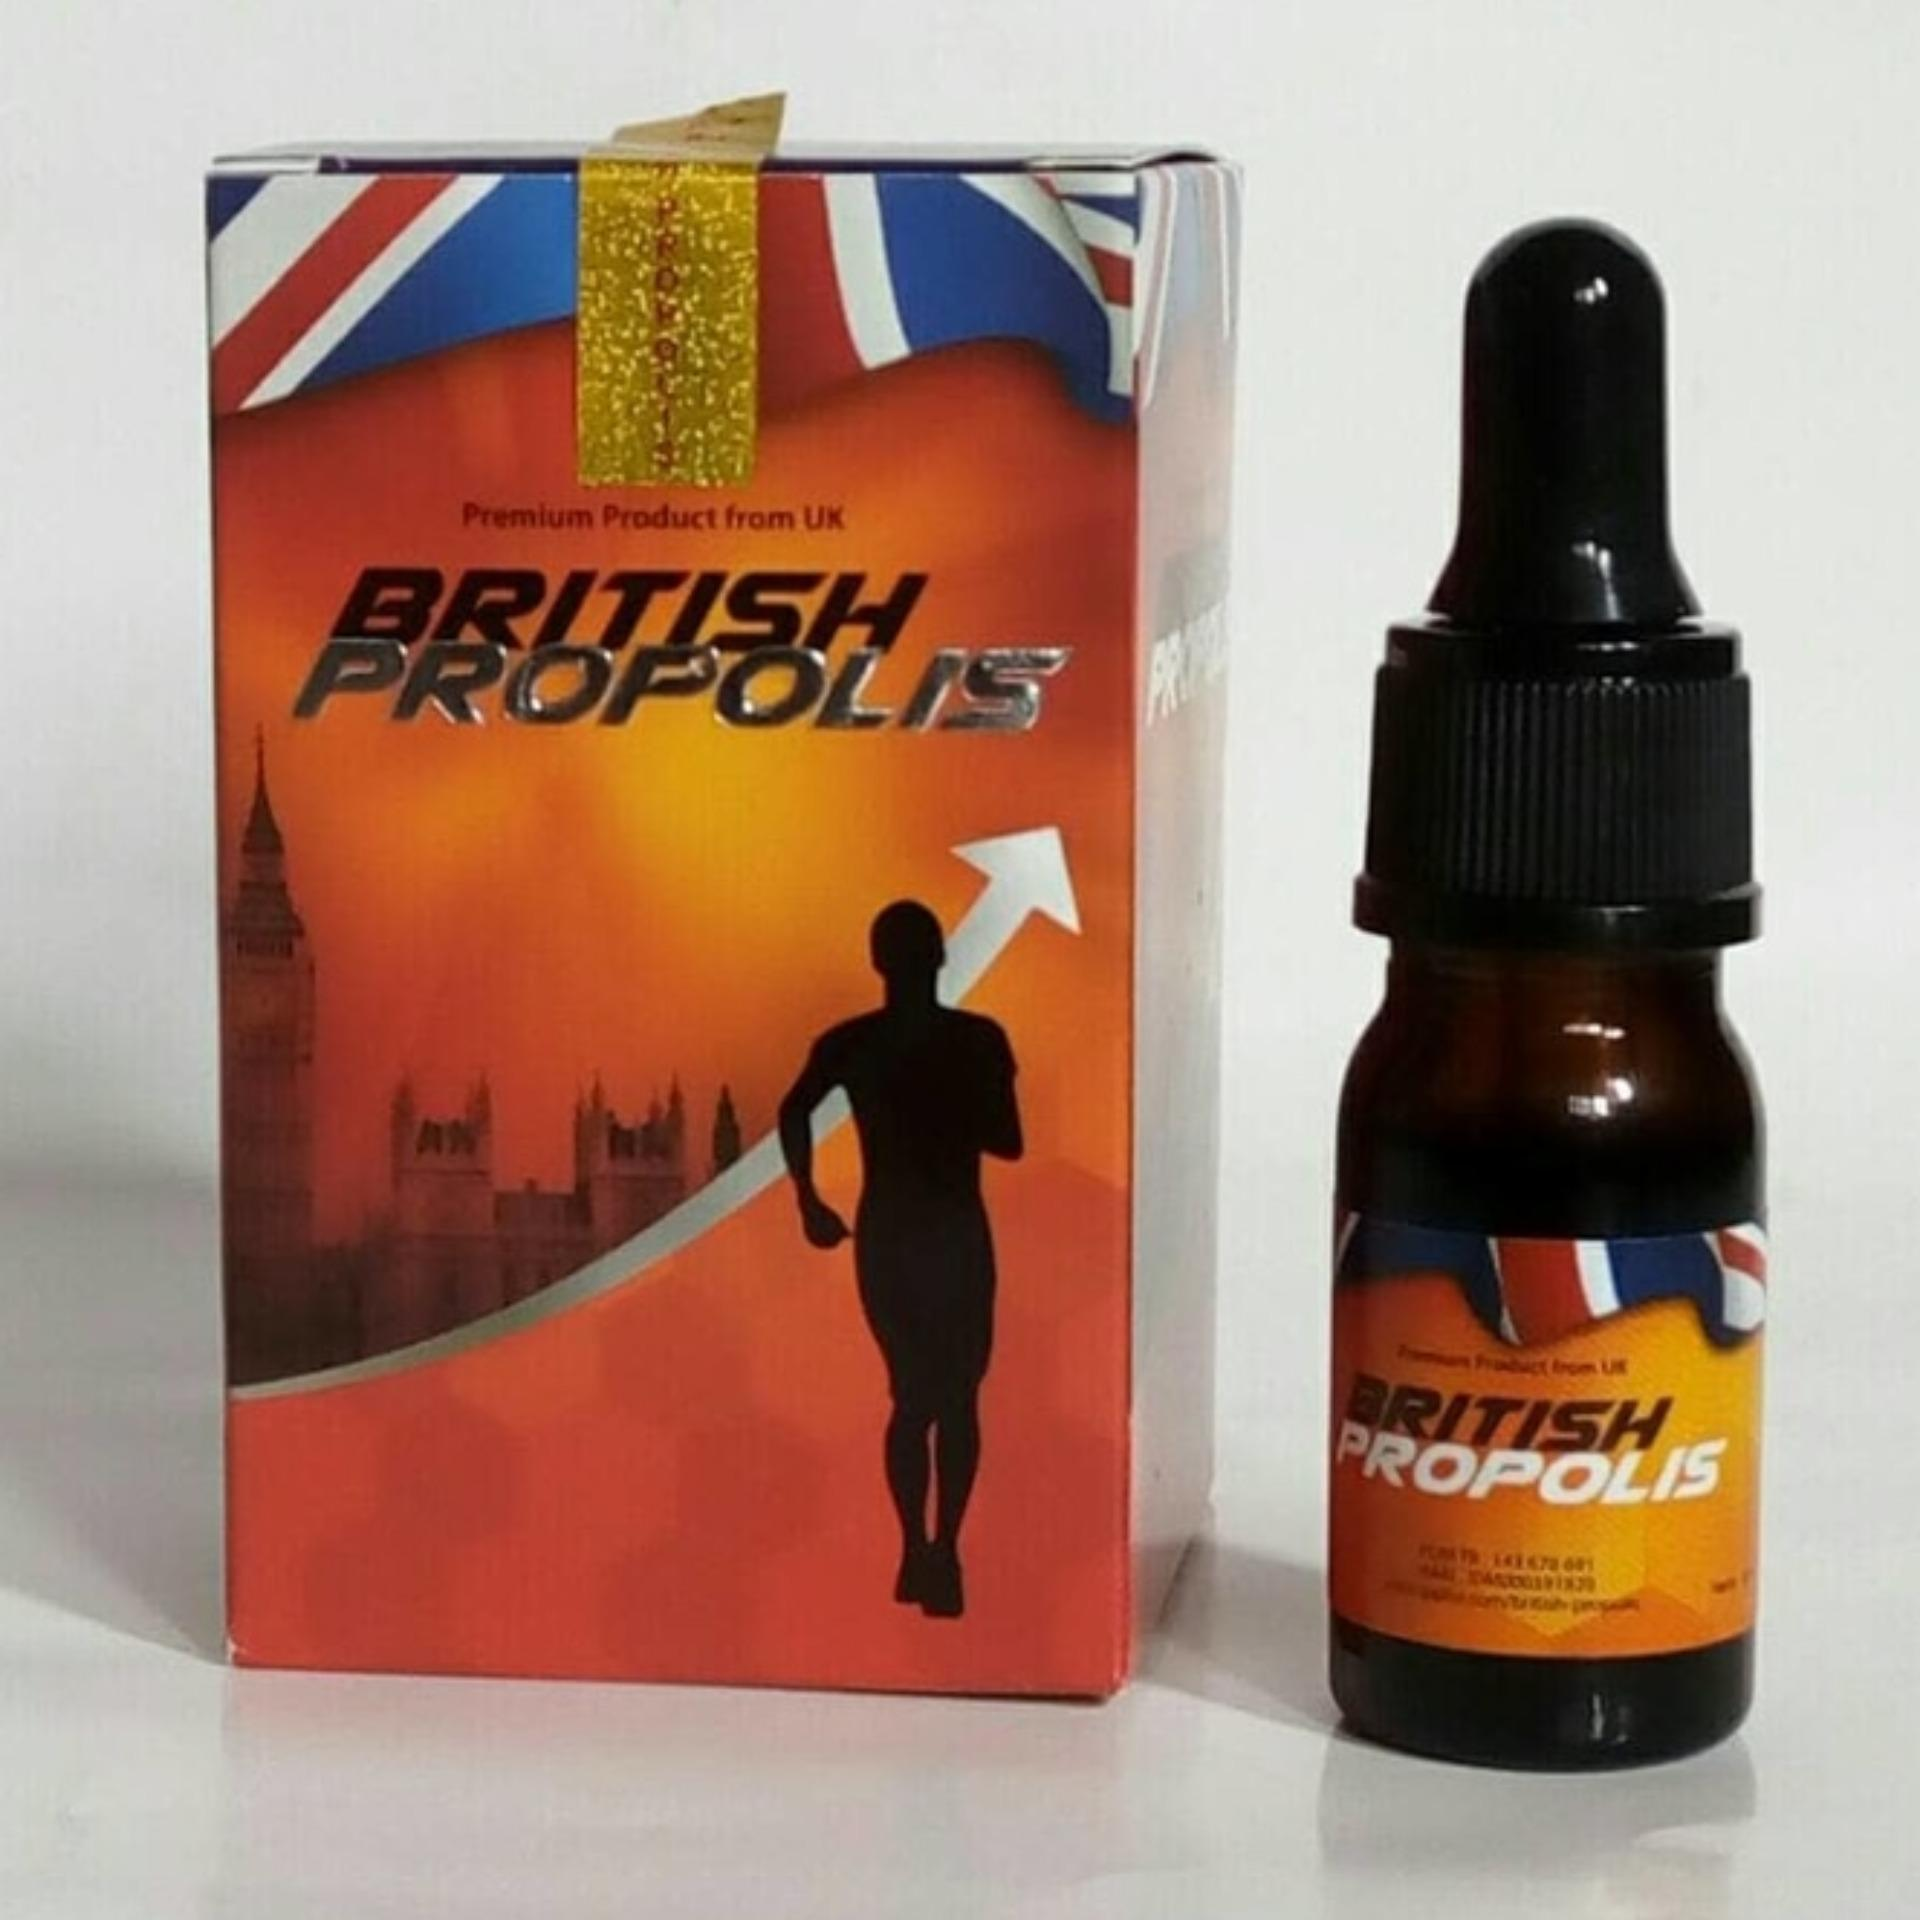 Dimana Beli British Propolis Premium Propolis British Propolis